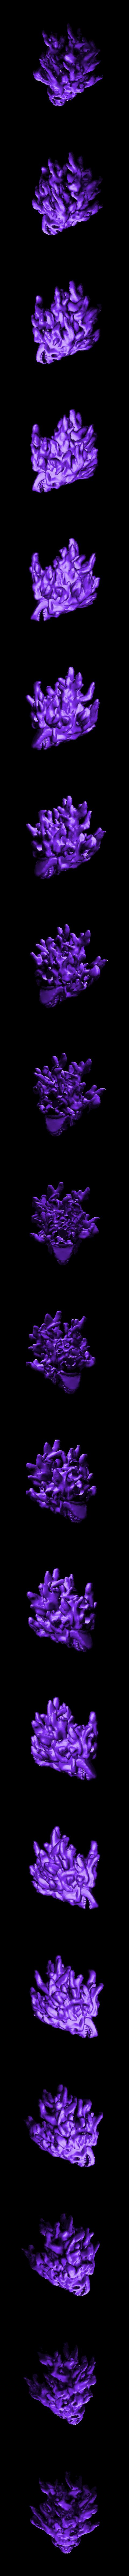 flamingSkull.stl Download free STL file Flaming Skull - 28mm D&D miniature • 3D printing model, pyrokahd